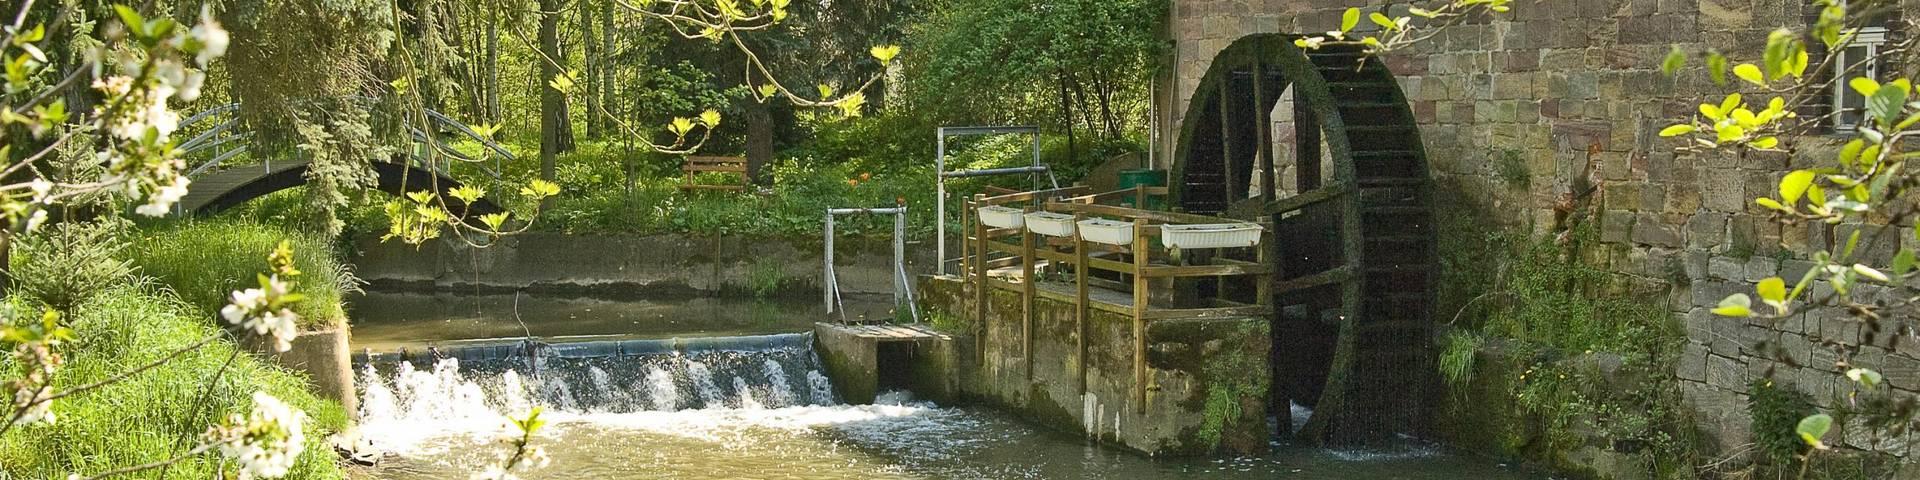 Wassermühle im Kroppental © Michael Rang